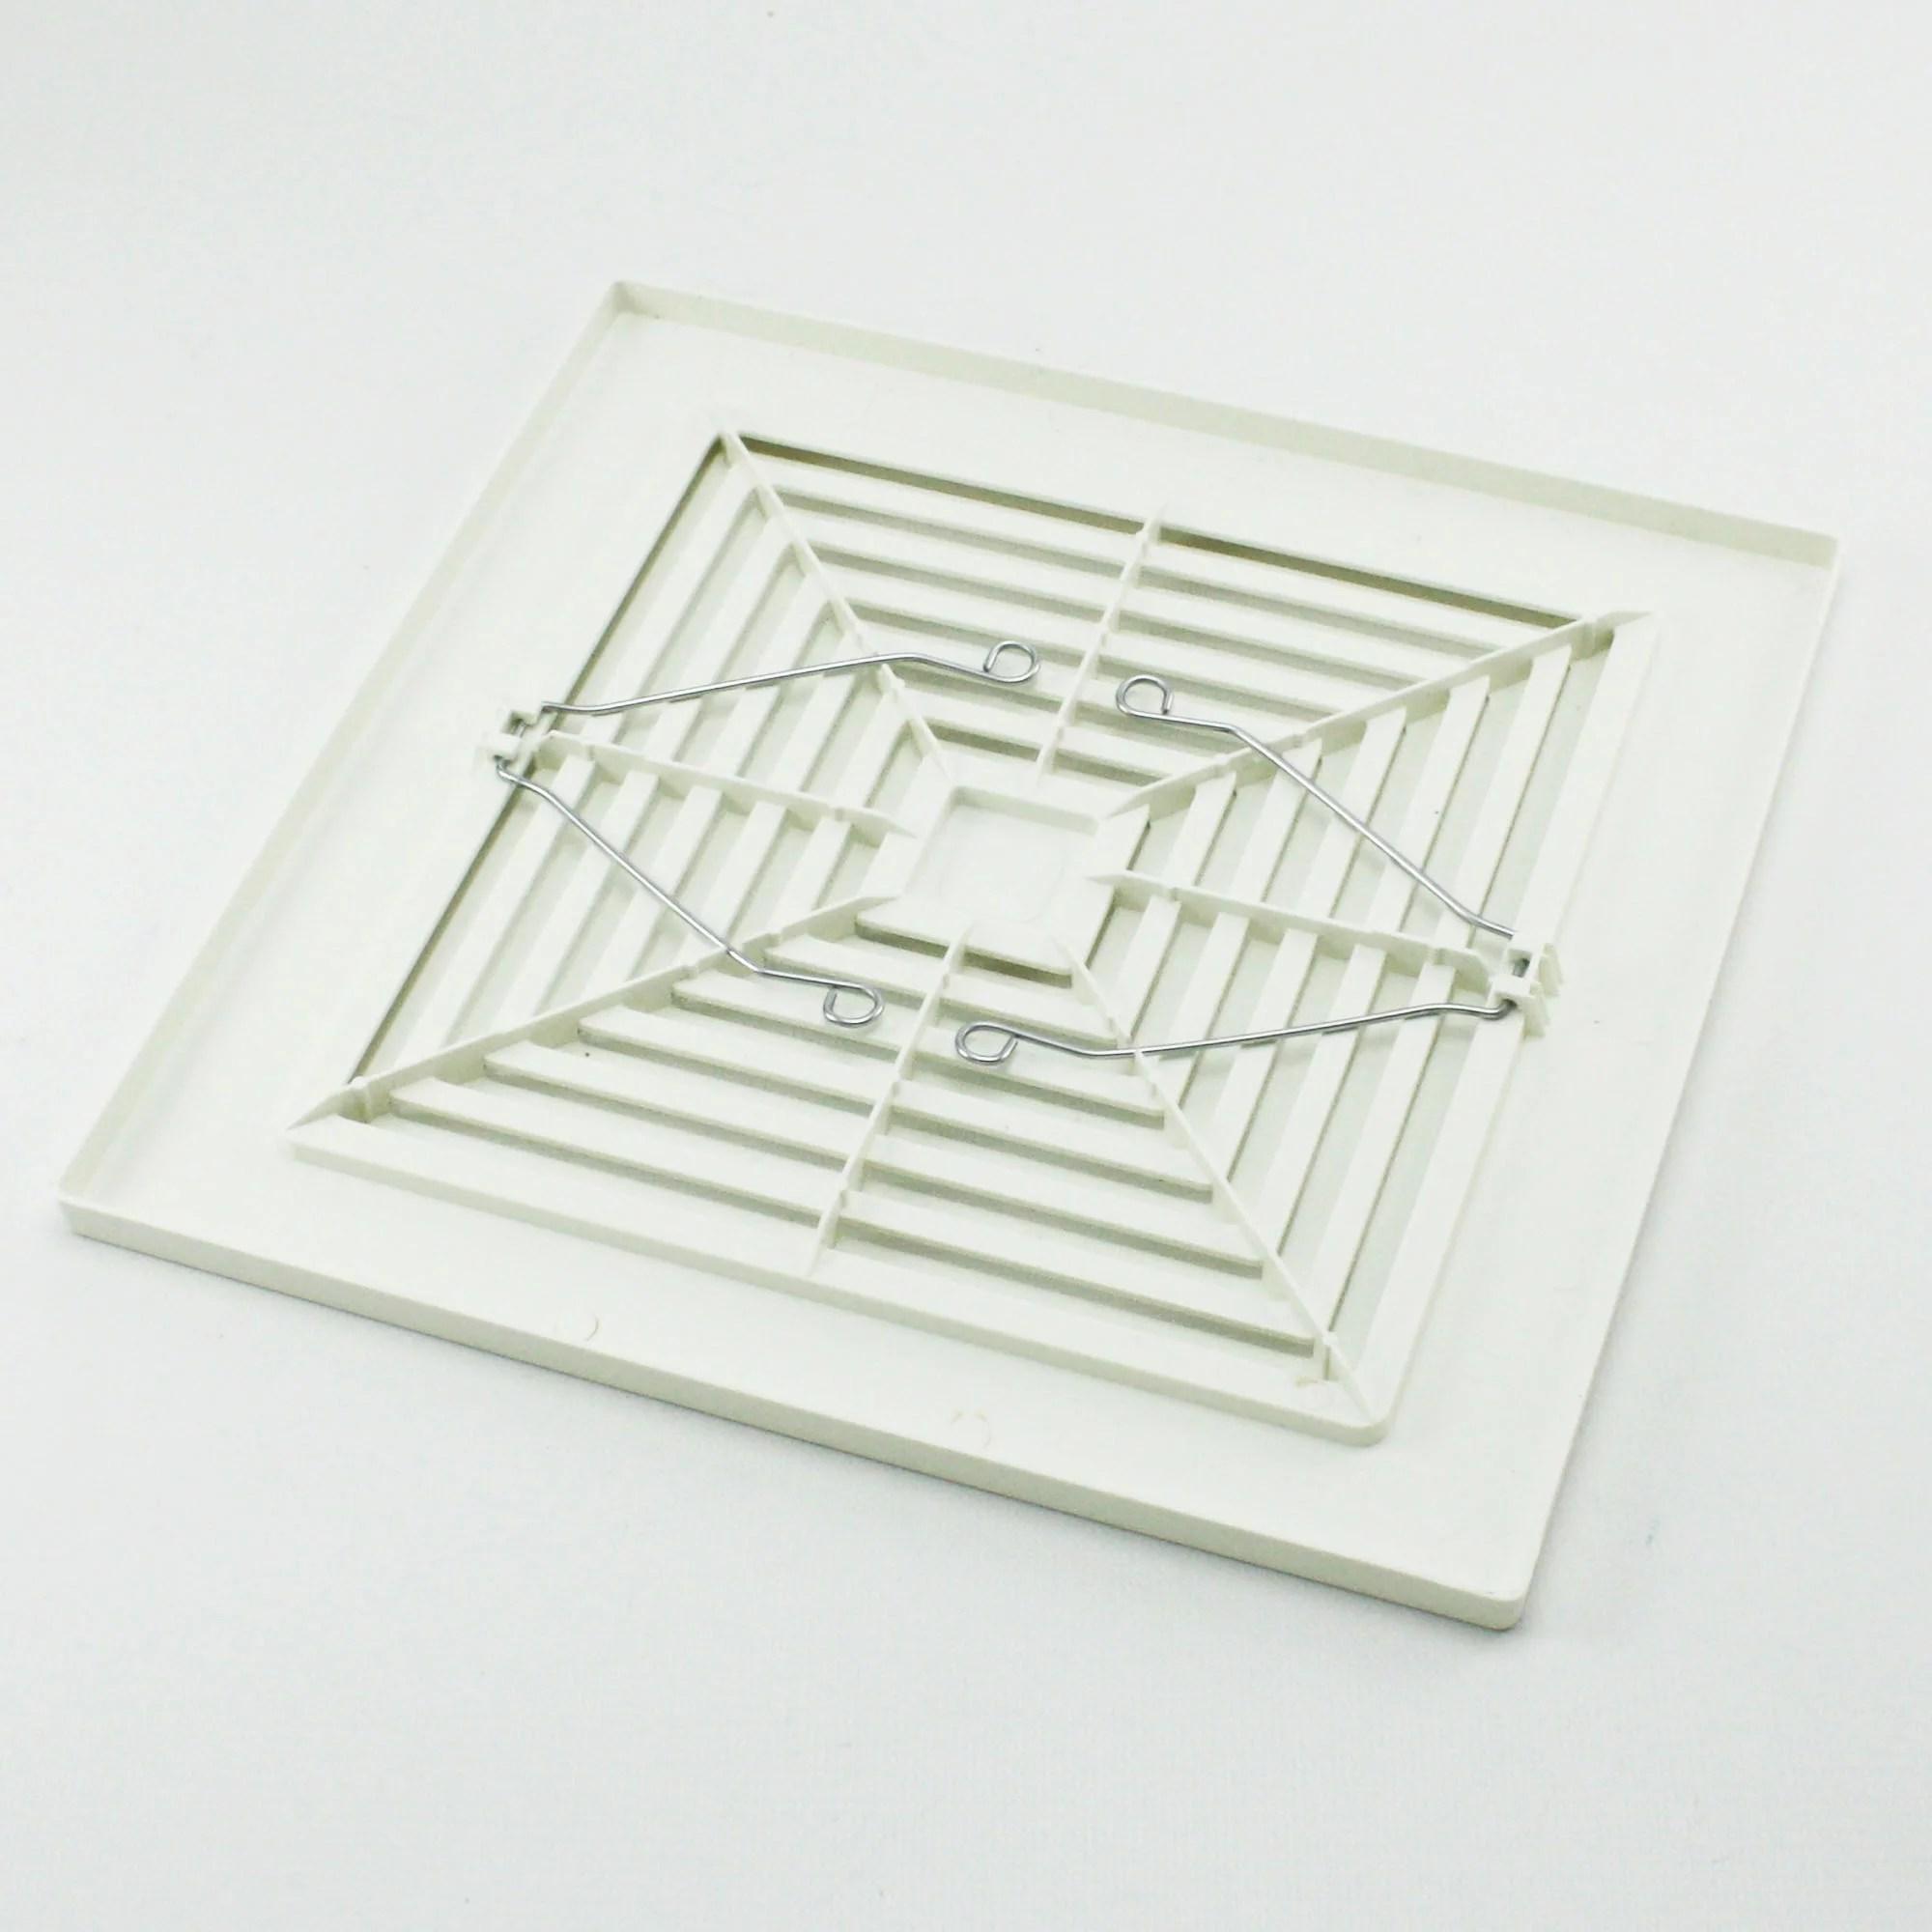 hight resolution of broan nutone 97011723 bath bathroom ceiling fan grille grill cover plastic white walmart com